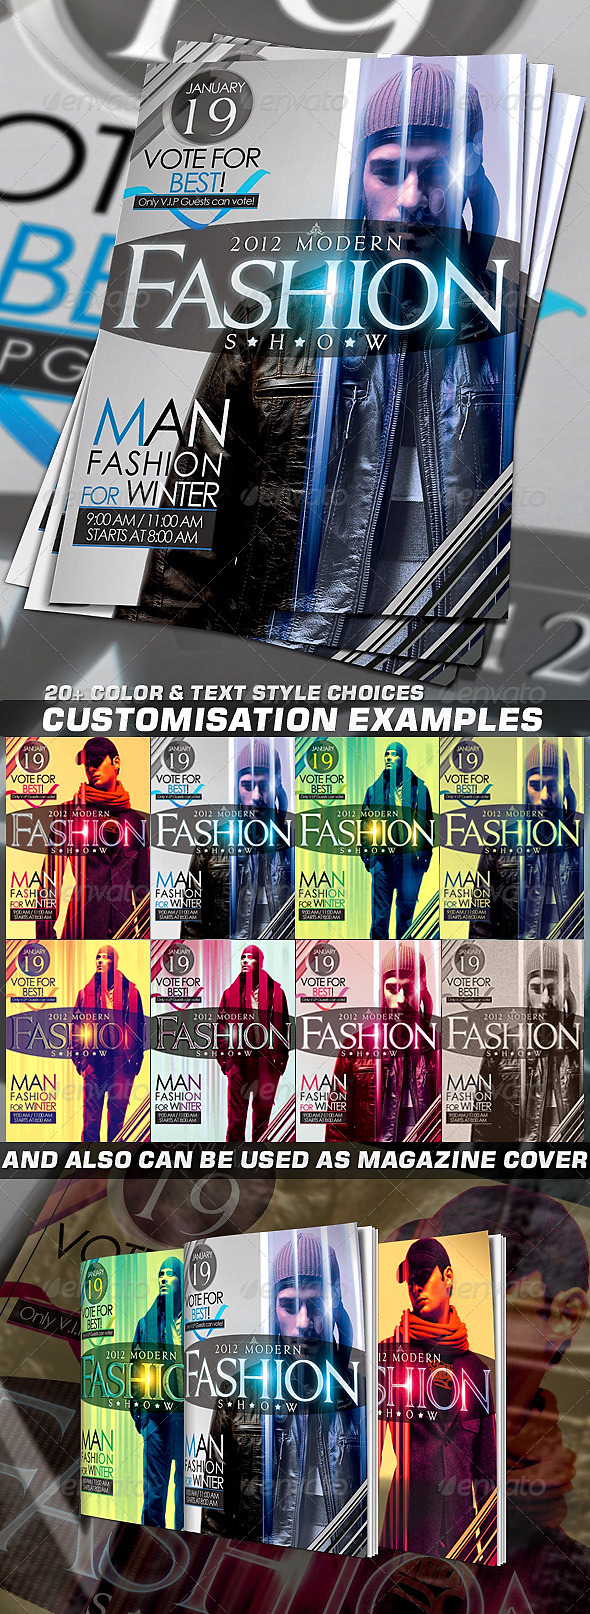 GraphicRiver Fashion Flyer or Magazine Cover Template 543255